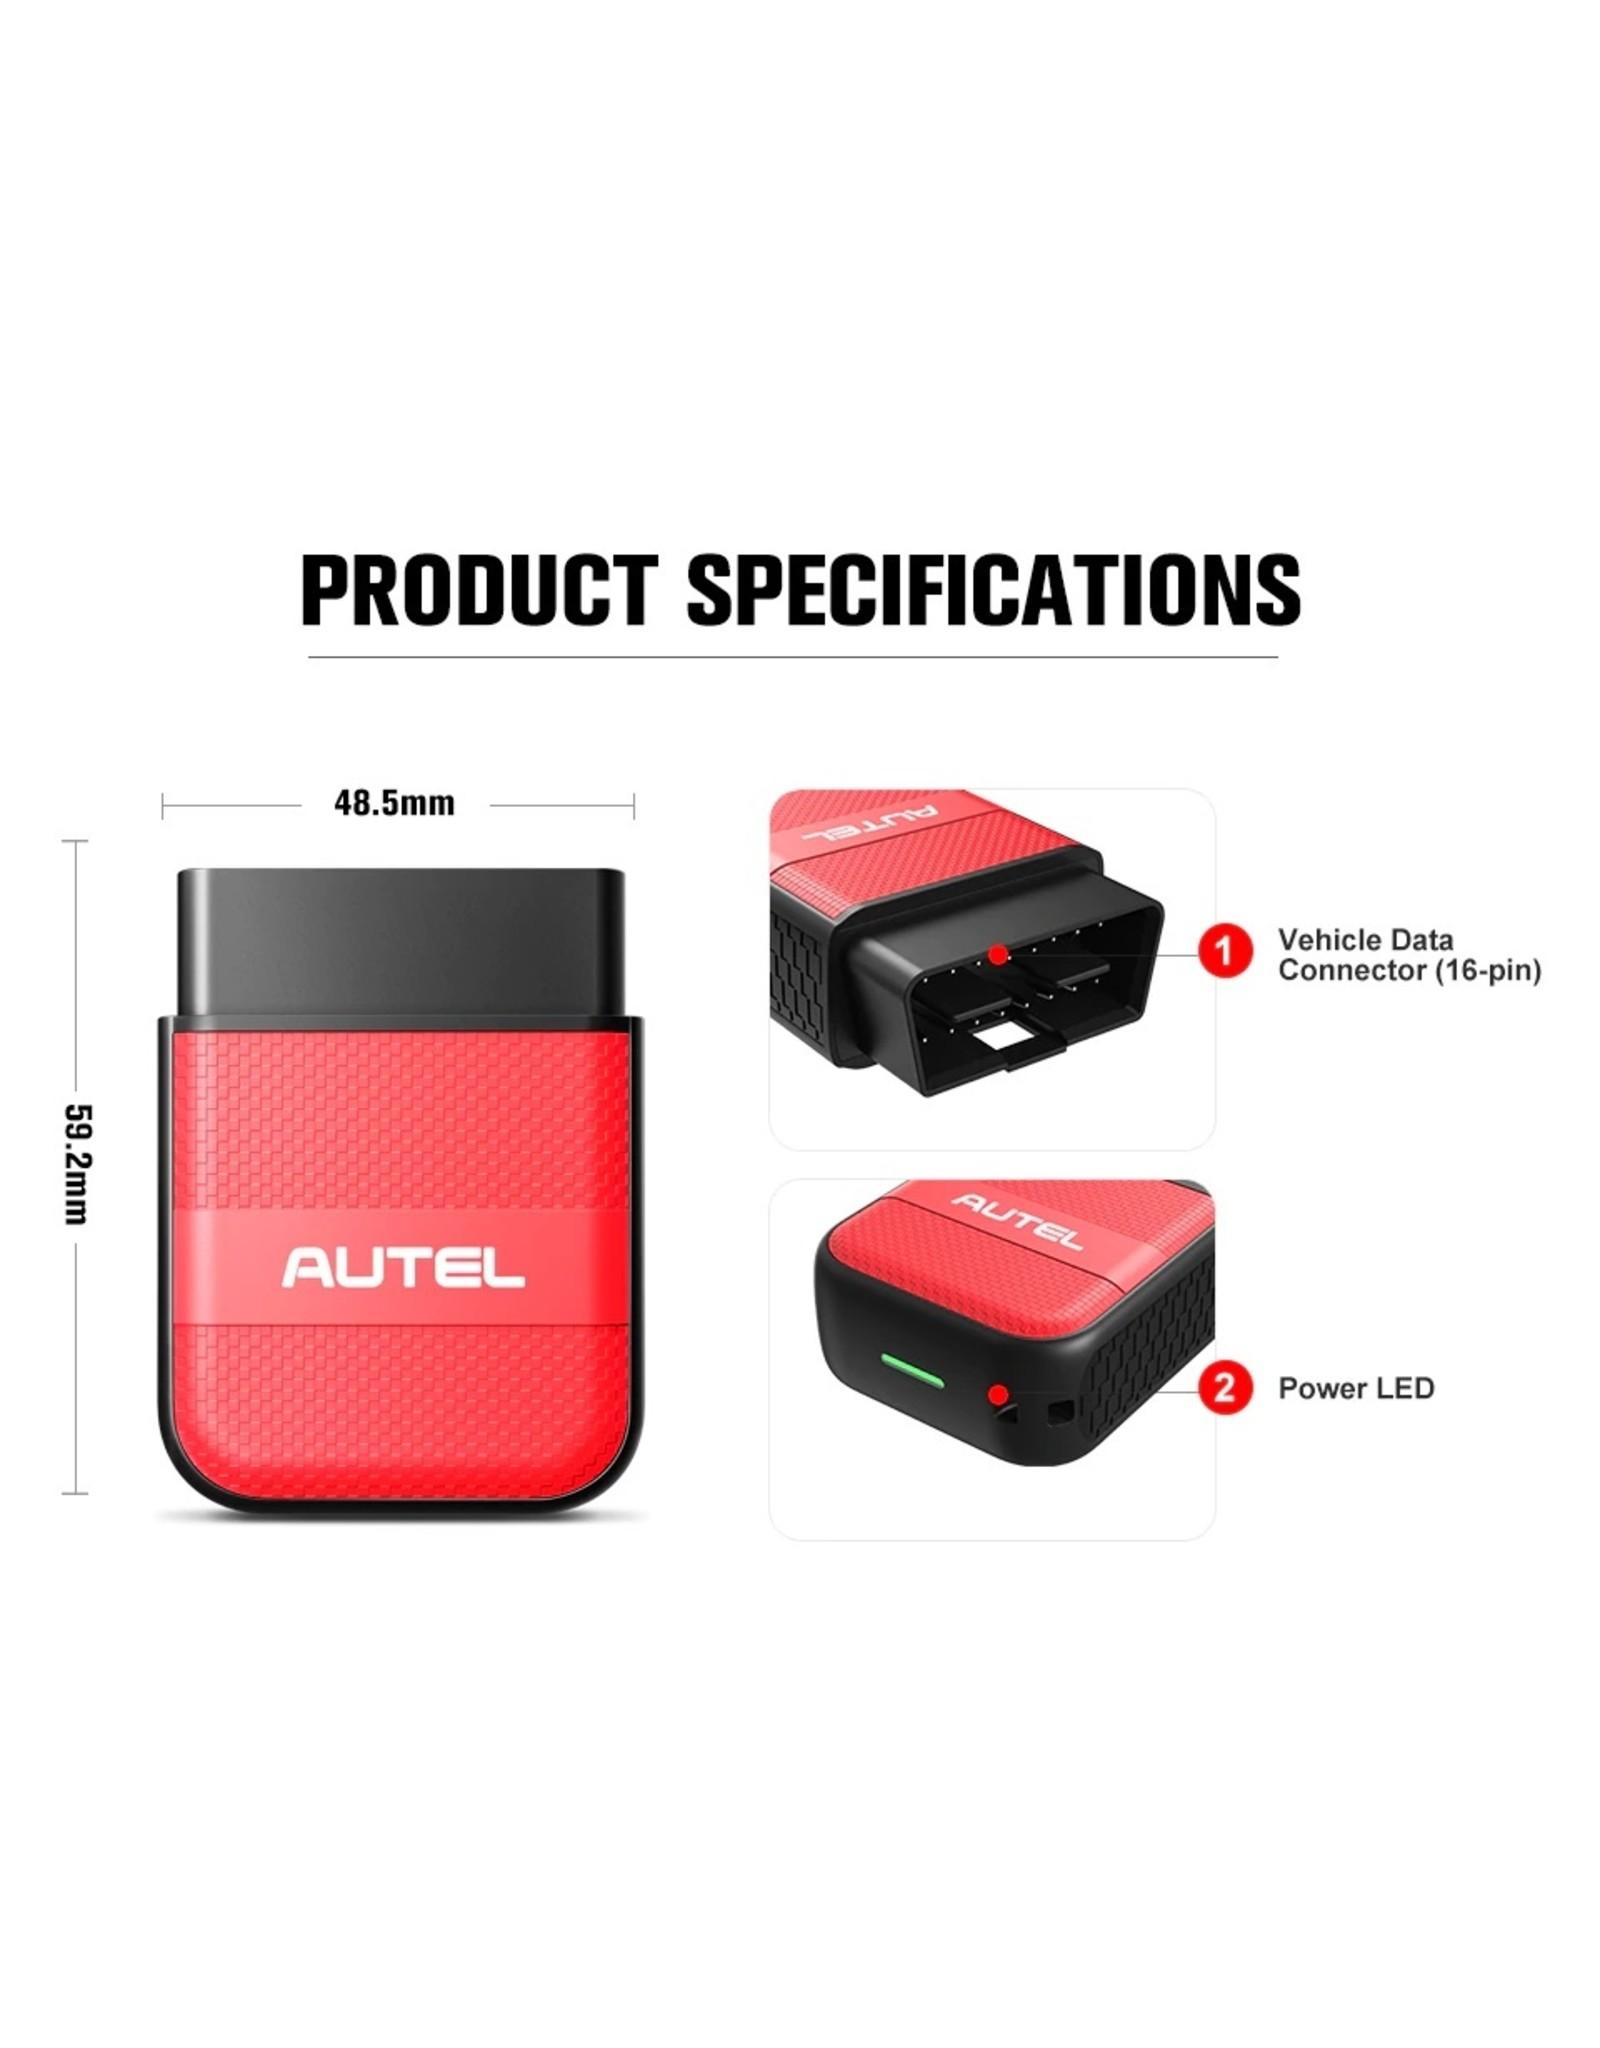 Autel AP200M OBD OBD2 Bluetooth Scanner Auto Diagnostisch Tool OBDII PK Easydiag 3.0 MD802 AP200 obd 2 diagnostisch